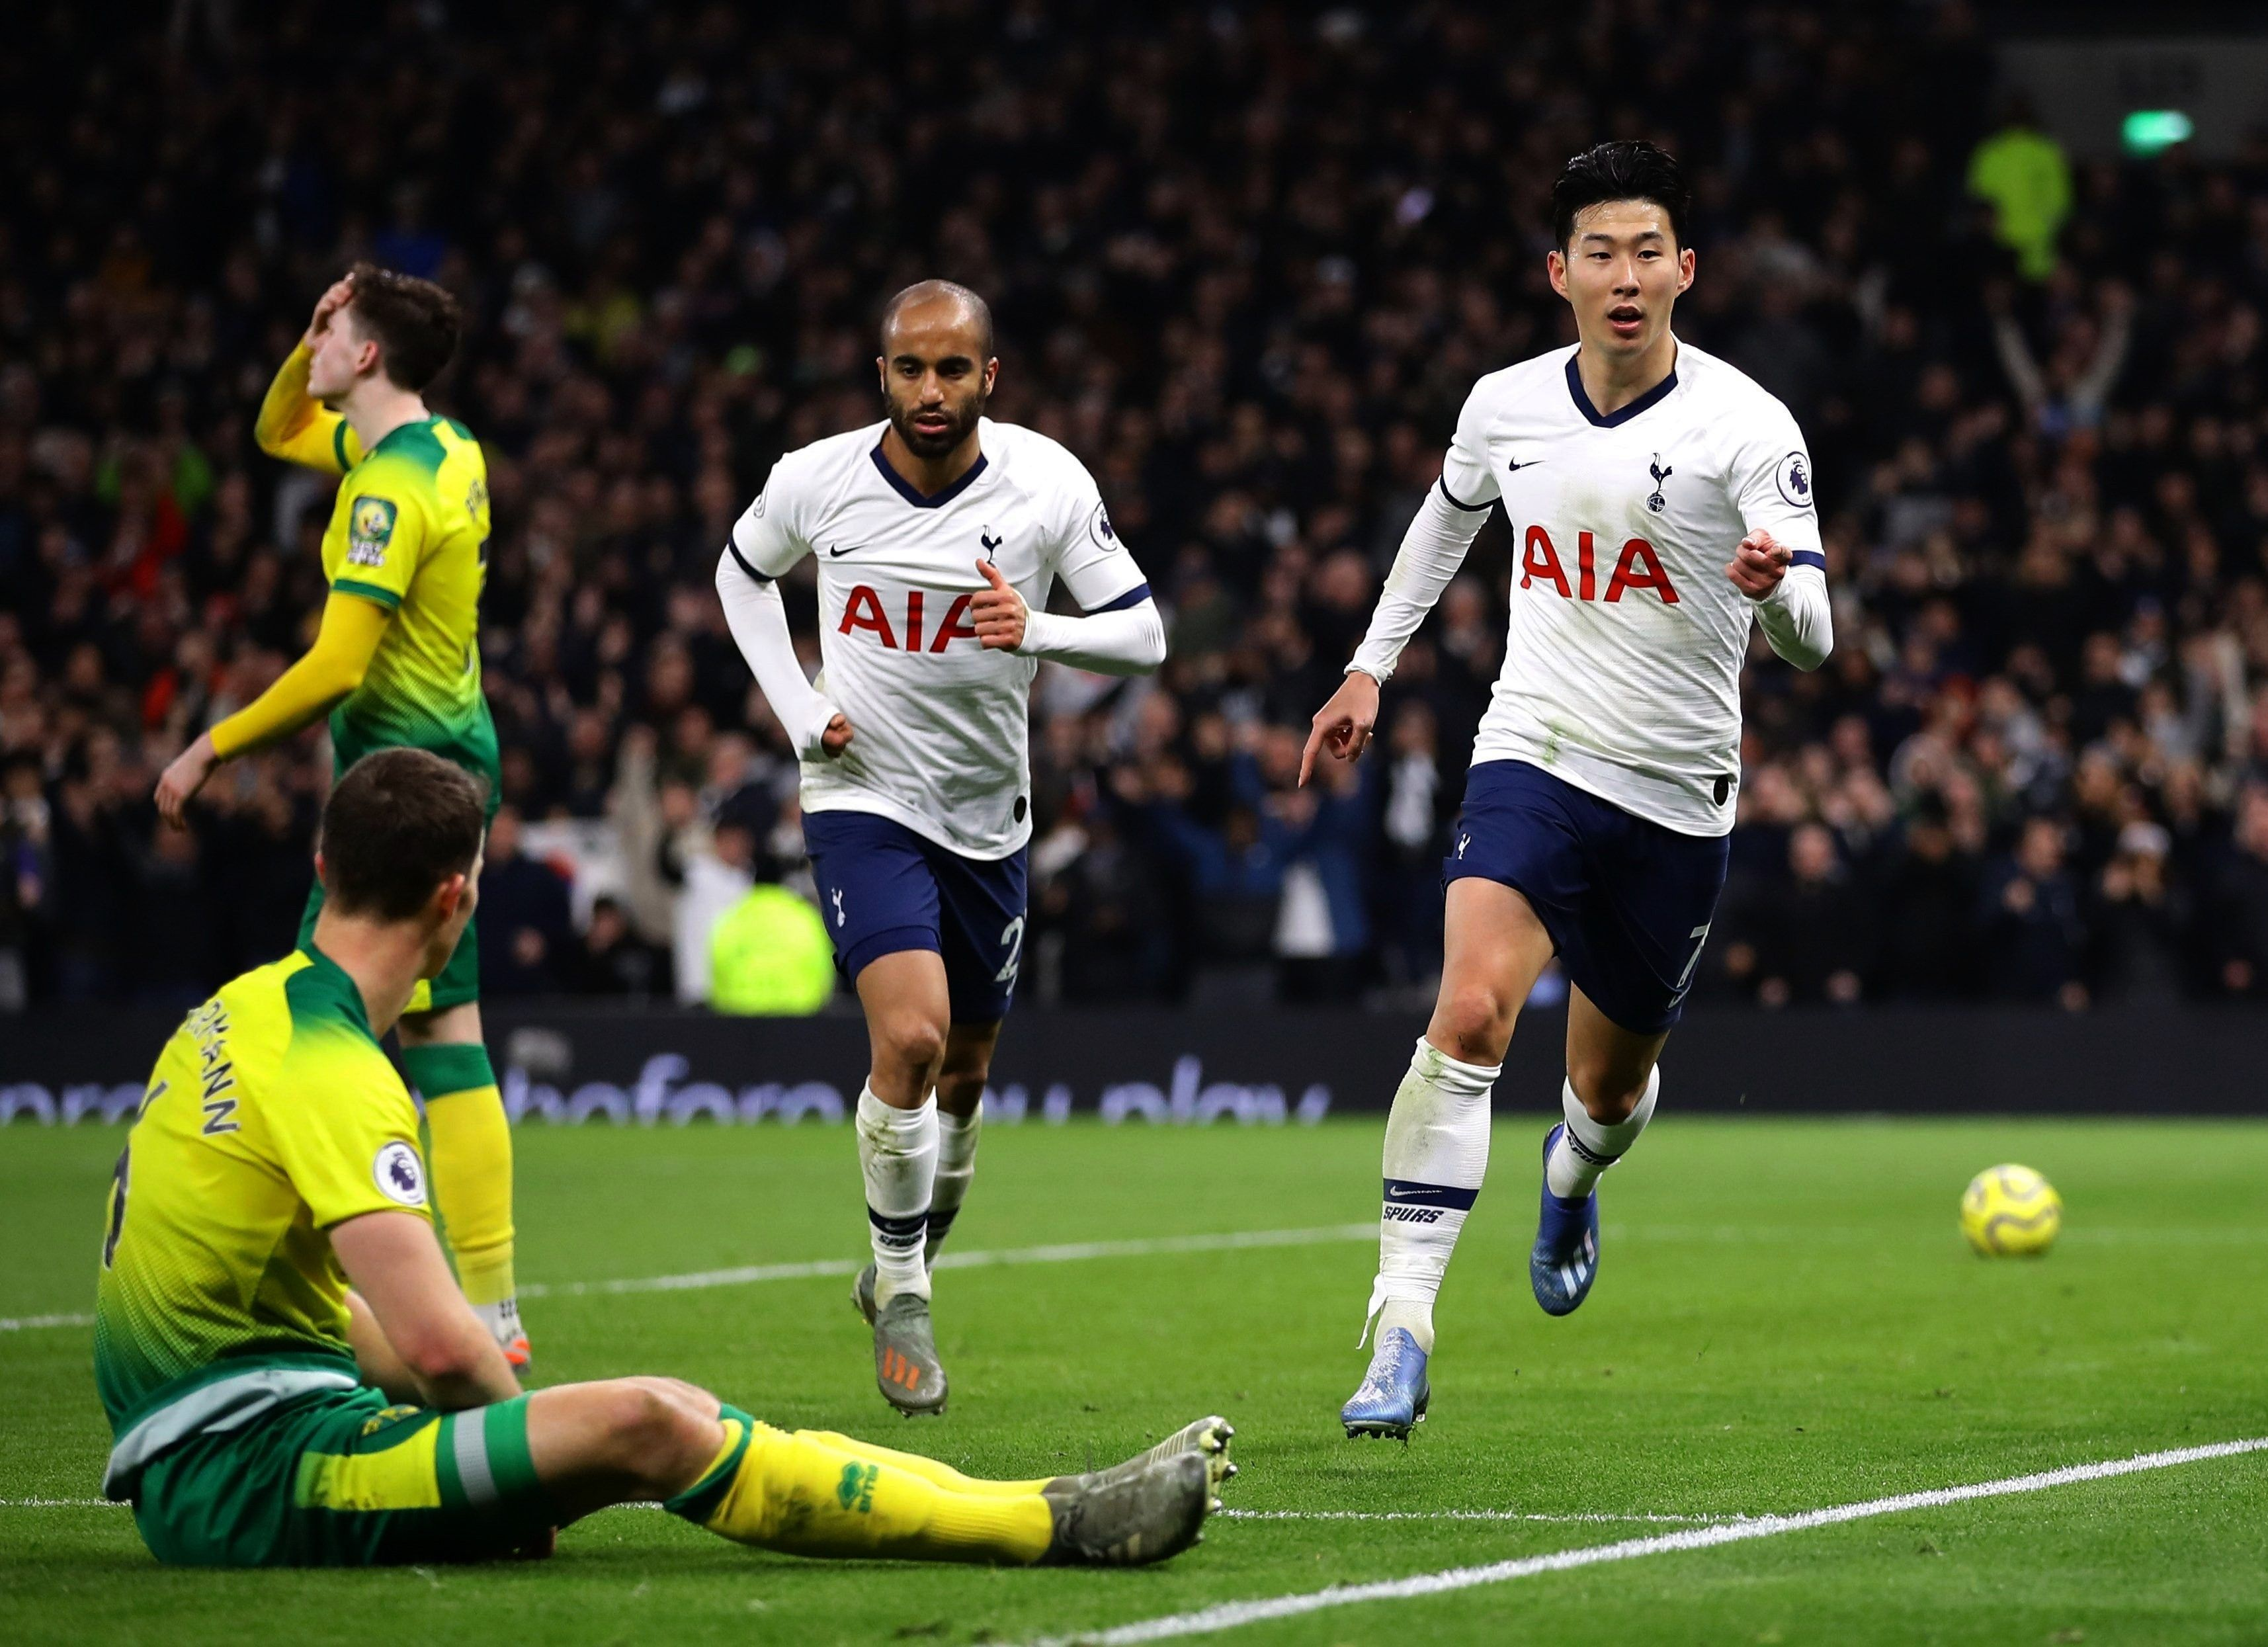 Championsleague Premierleague Realmadrid Tottenham Leicester Football Fussball Futebol Norwich Premier Ronaldo Winless Finally Results Victorypre 2020